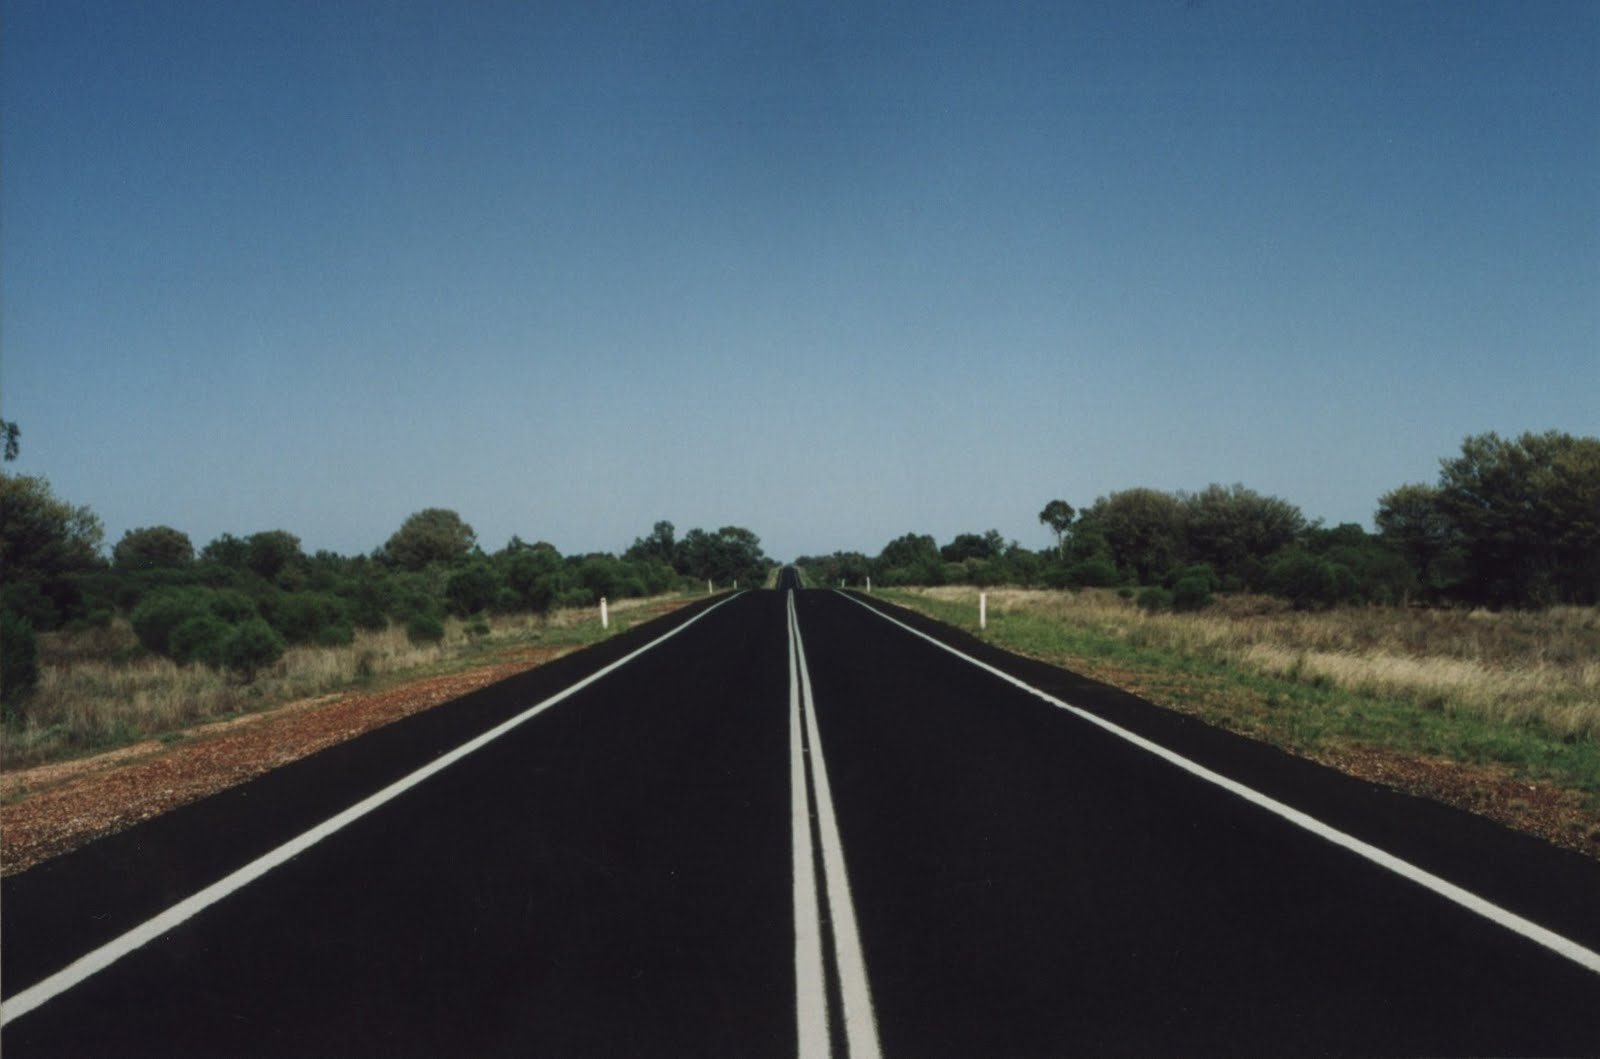 Bob Palmer's Blog: The World's longest straight paved road ozzzz.,